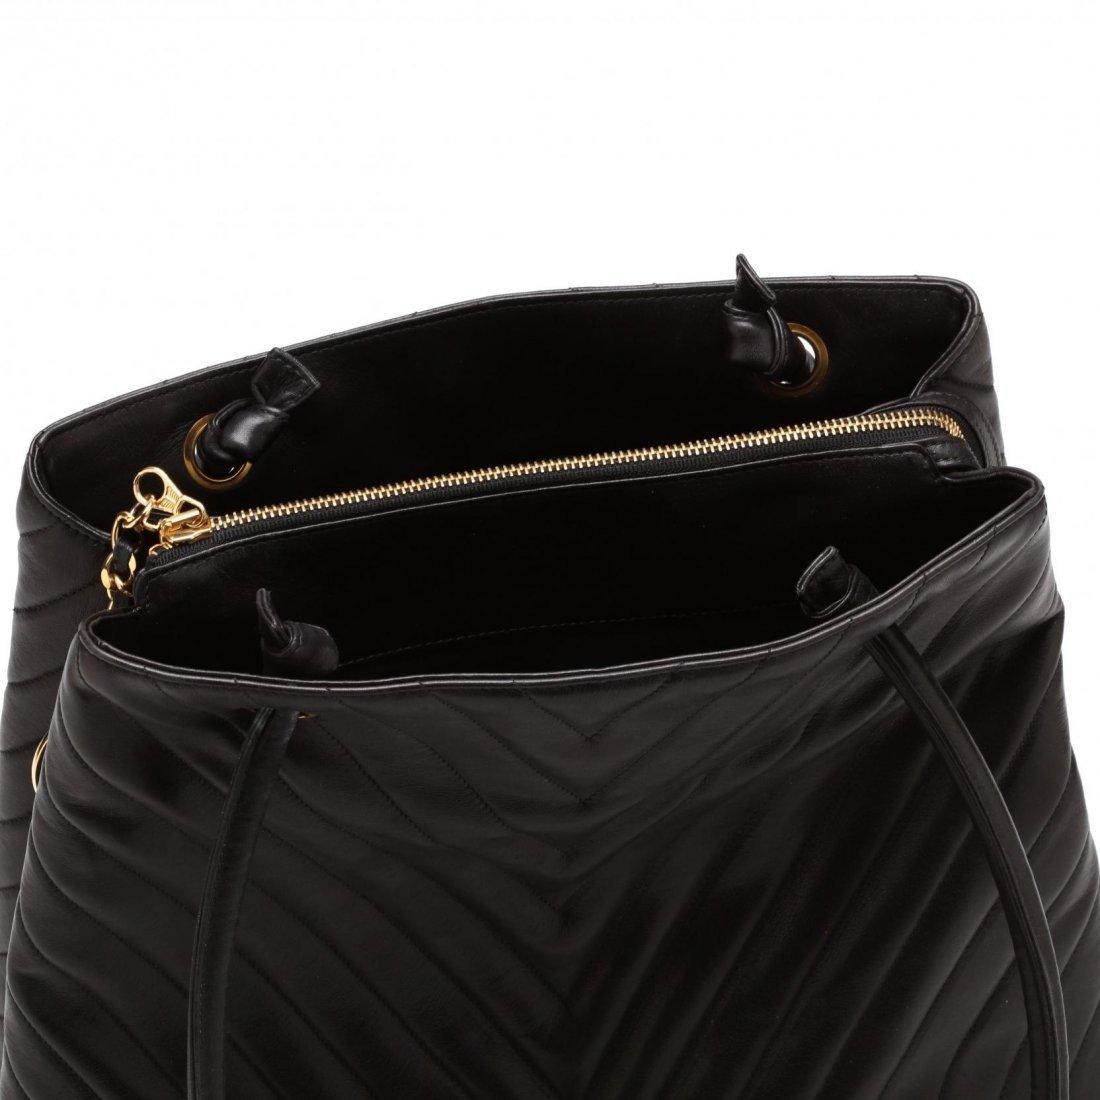 Vintage Lambskin Chevron Handbag, Chanel - 4